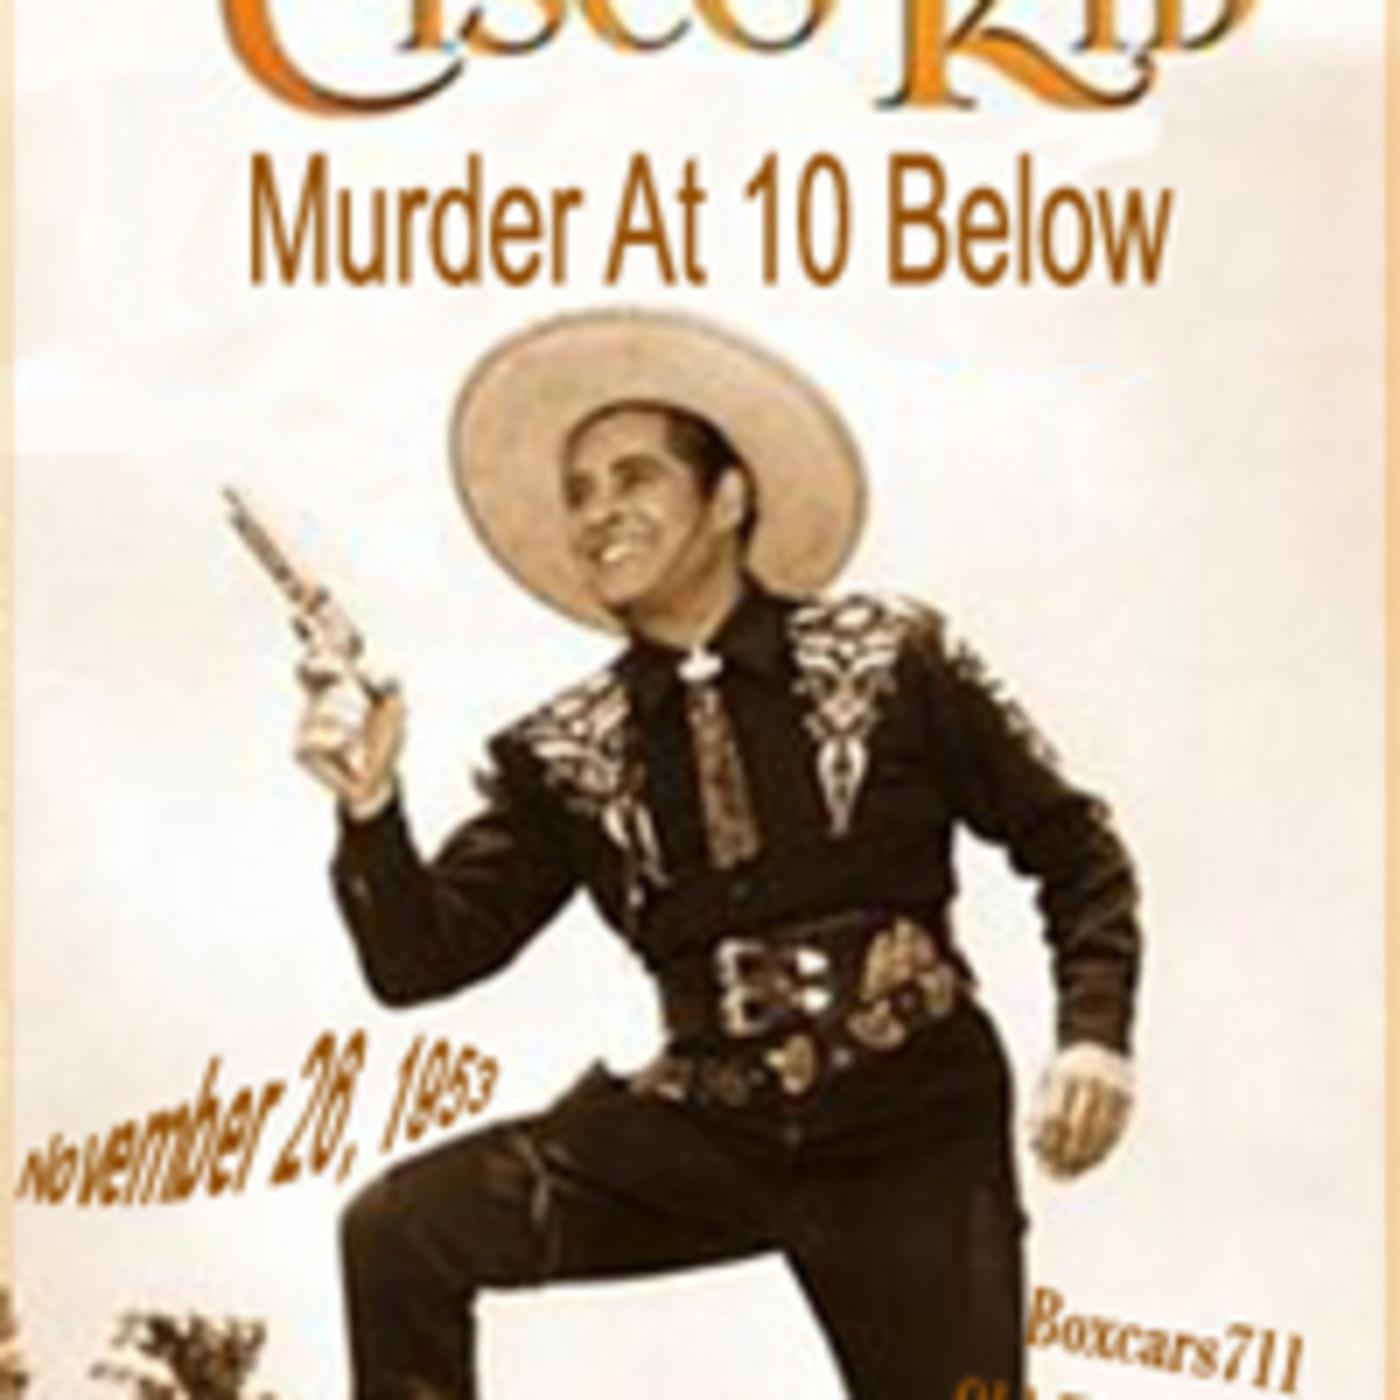 "Boxcars711 Overnight Western ""Cisco Kid"" - Murder At 10 Below (11-26-53)"